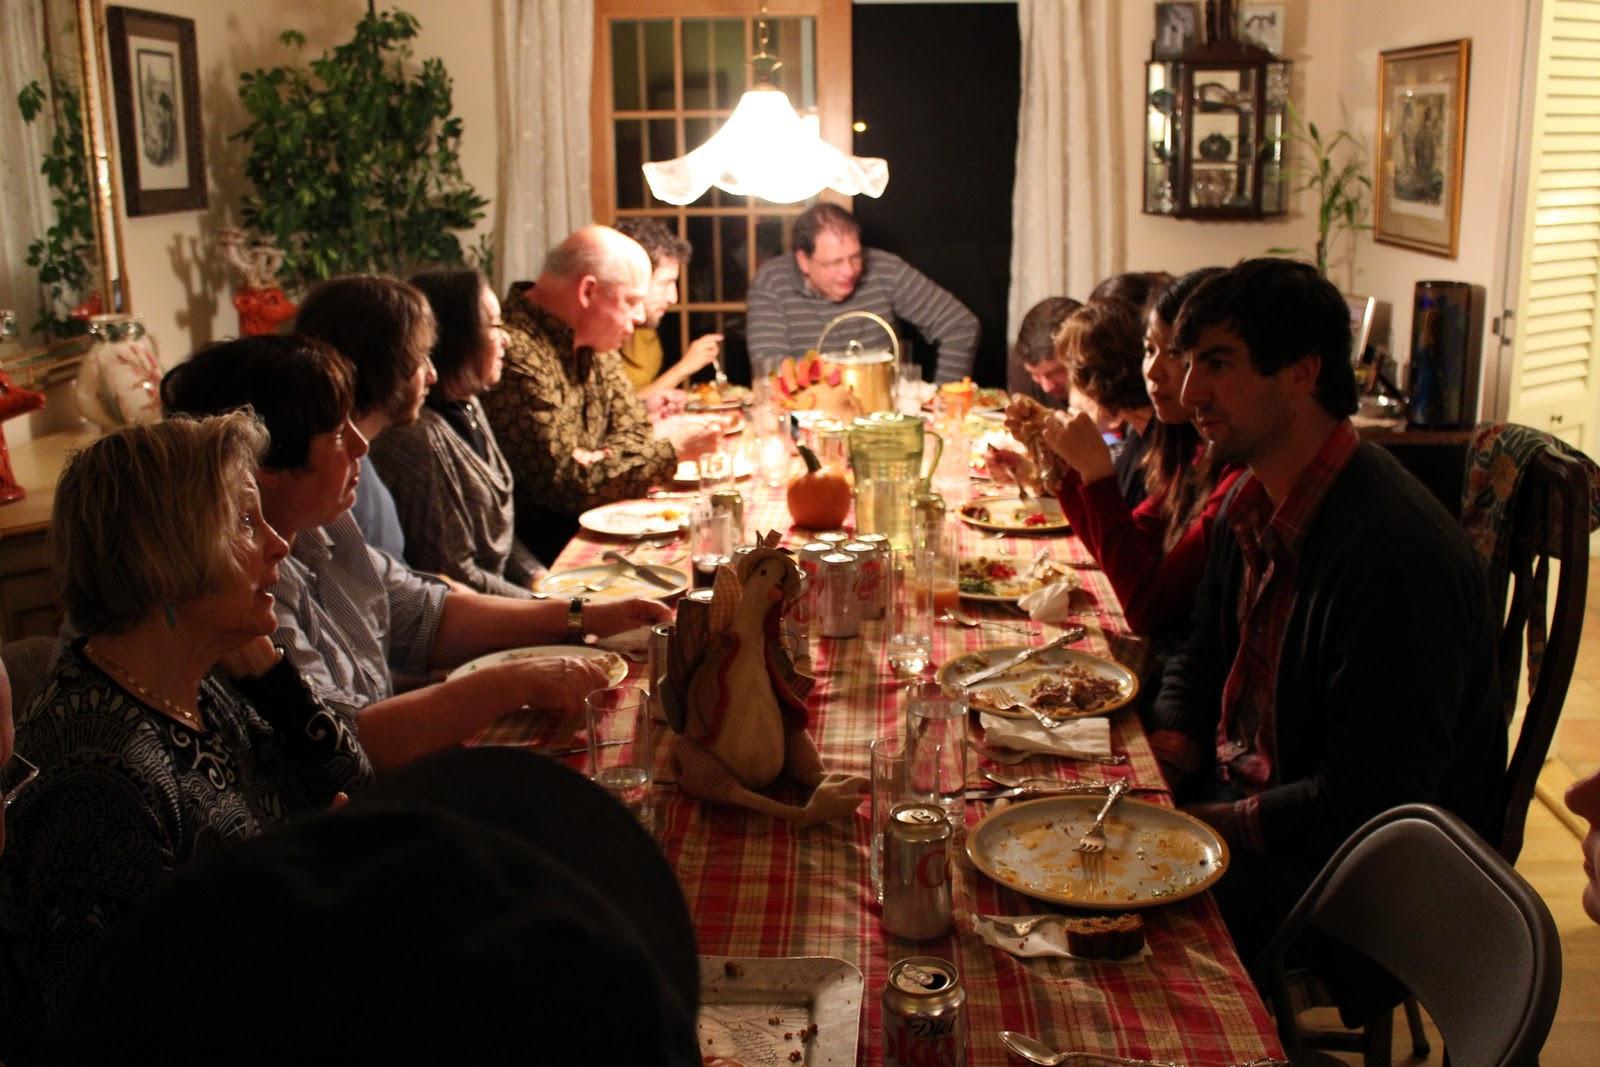 Family Thanksgiving Dinner  Photastic USA THANKSGIVING